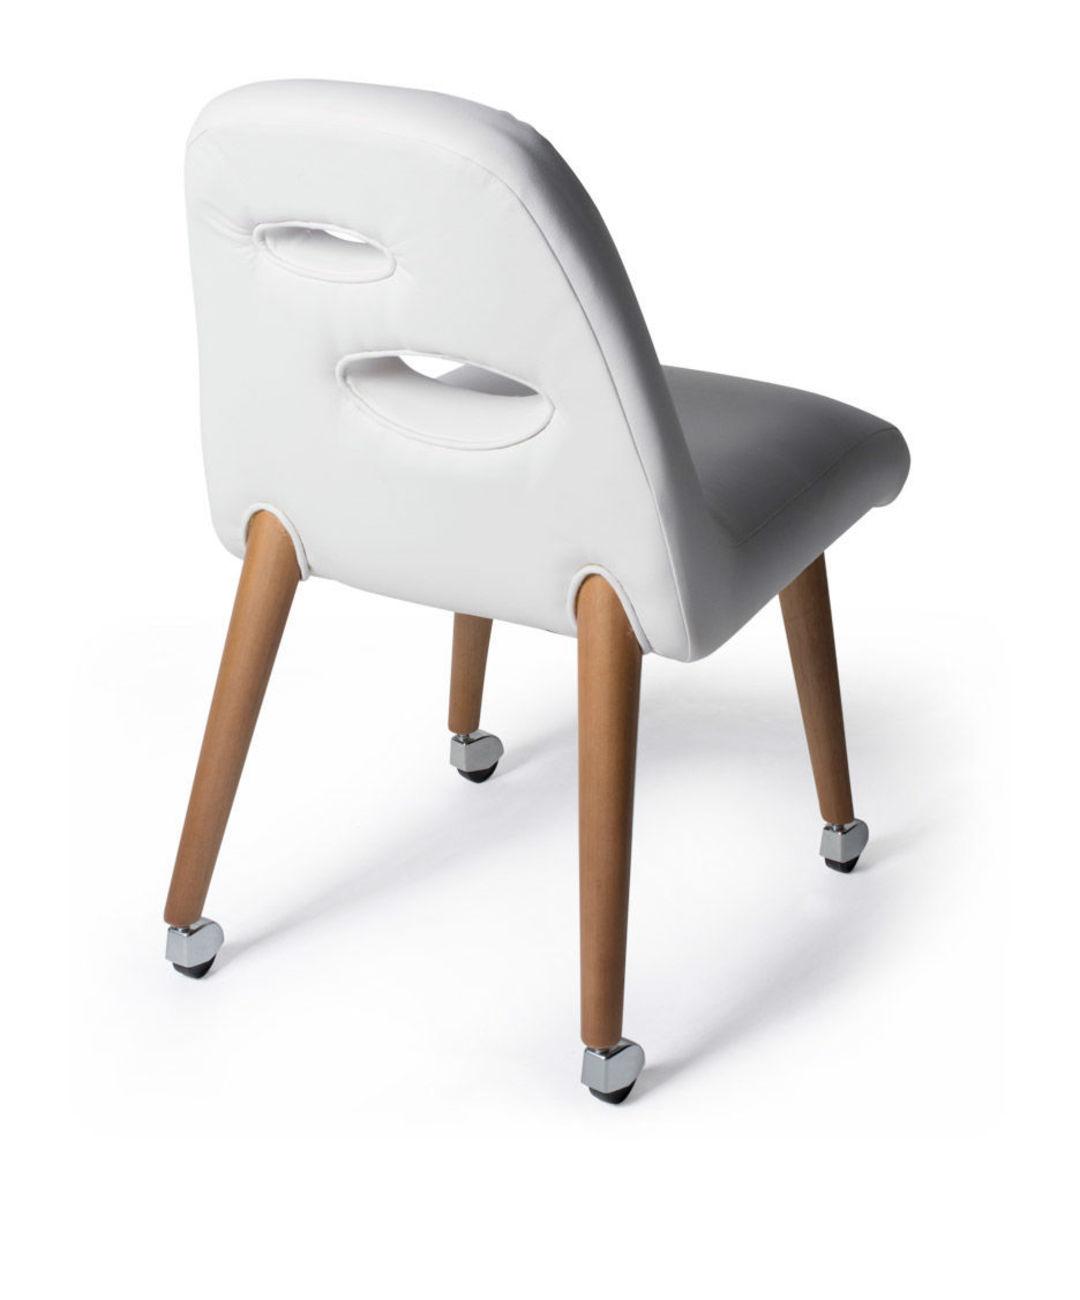 高脚椅Cavaquinho